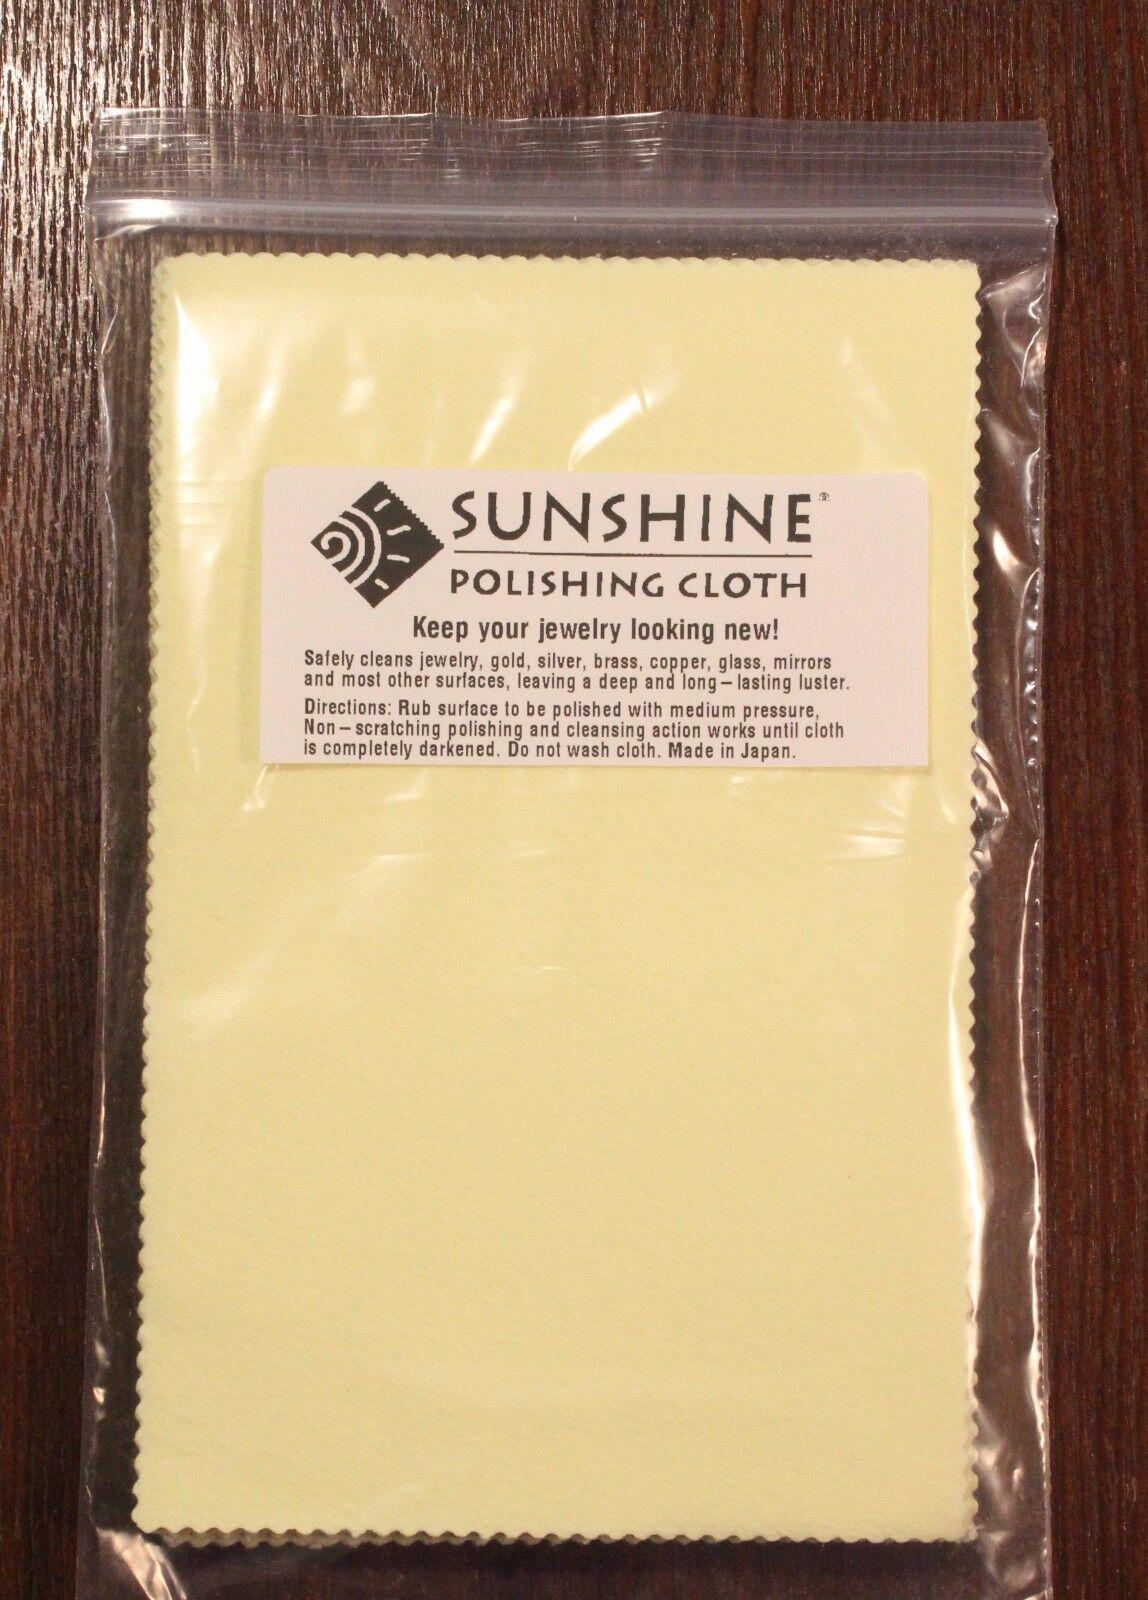 Five (5) Sunshine Polishing Cloth Jewelry Cleaner Gold Silver Brass Polisher